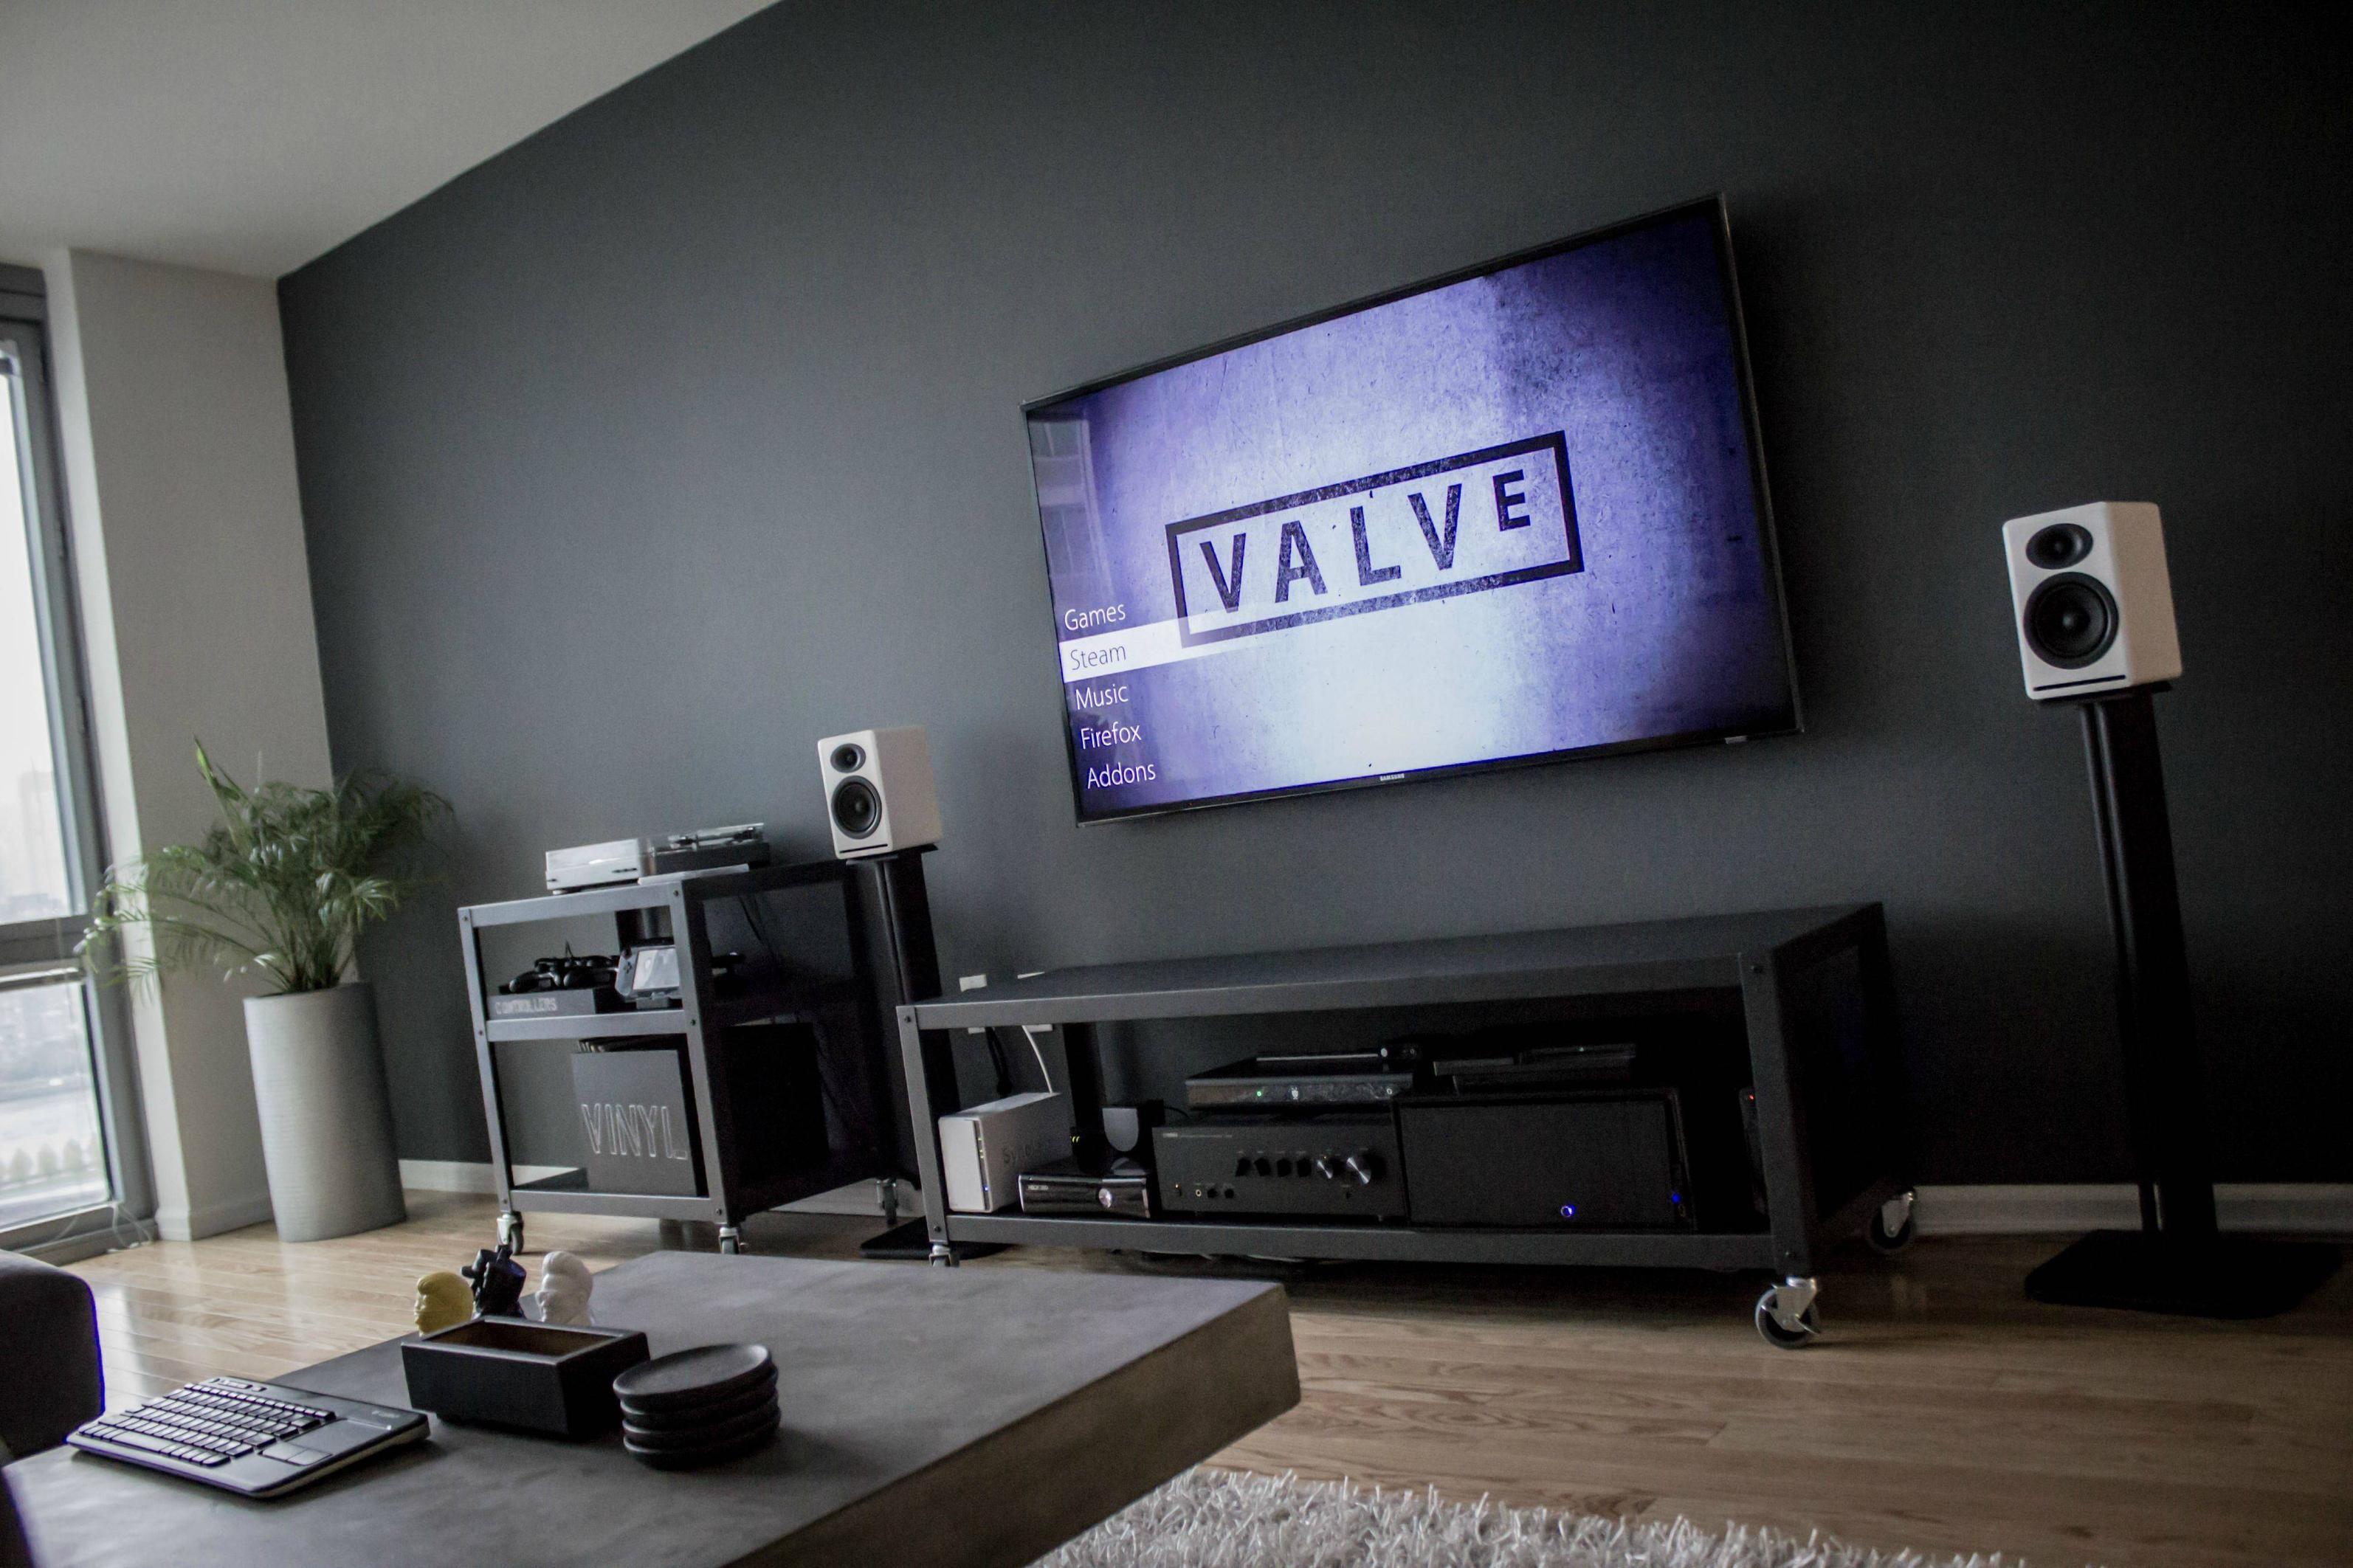 Battlestation | Living room setup, Small apartment living ...